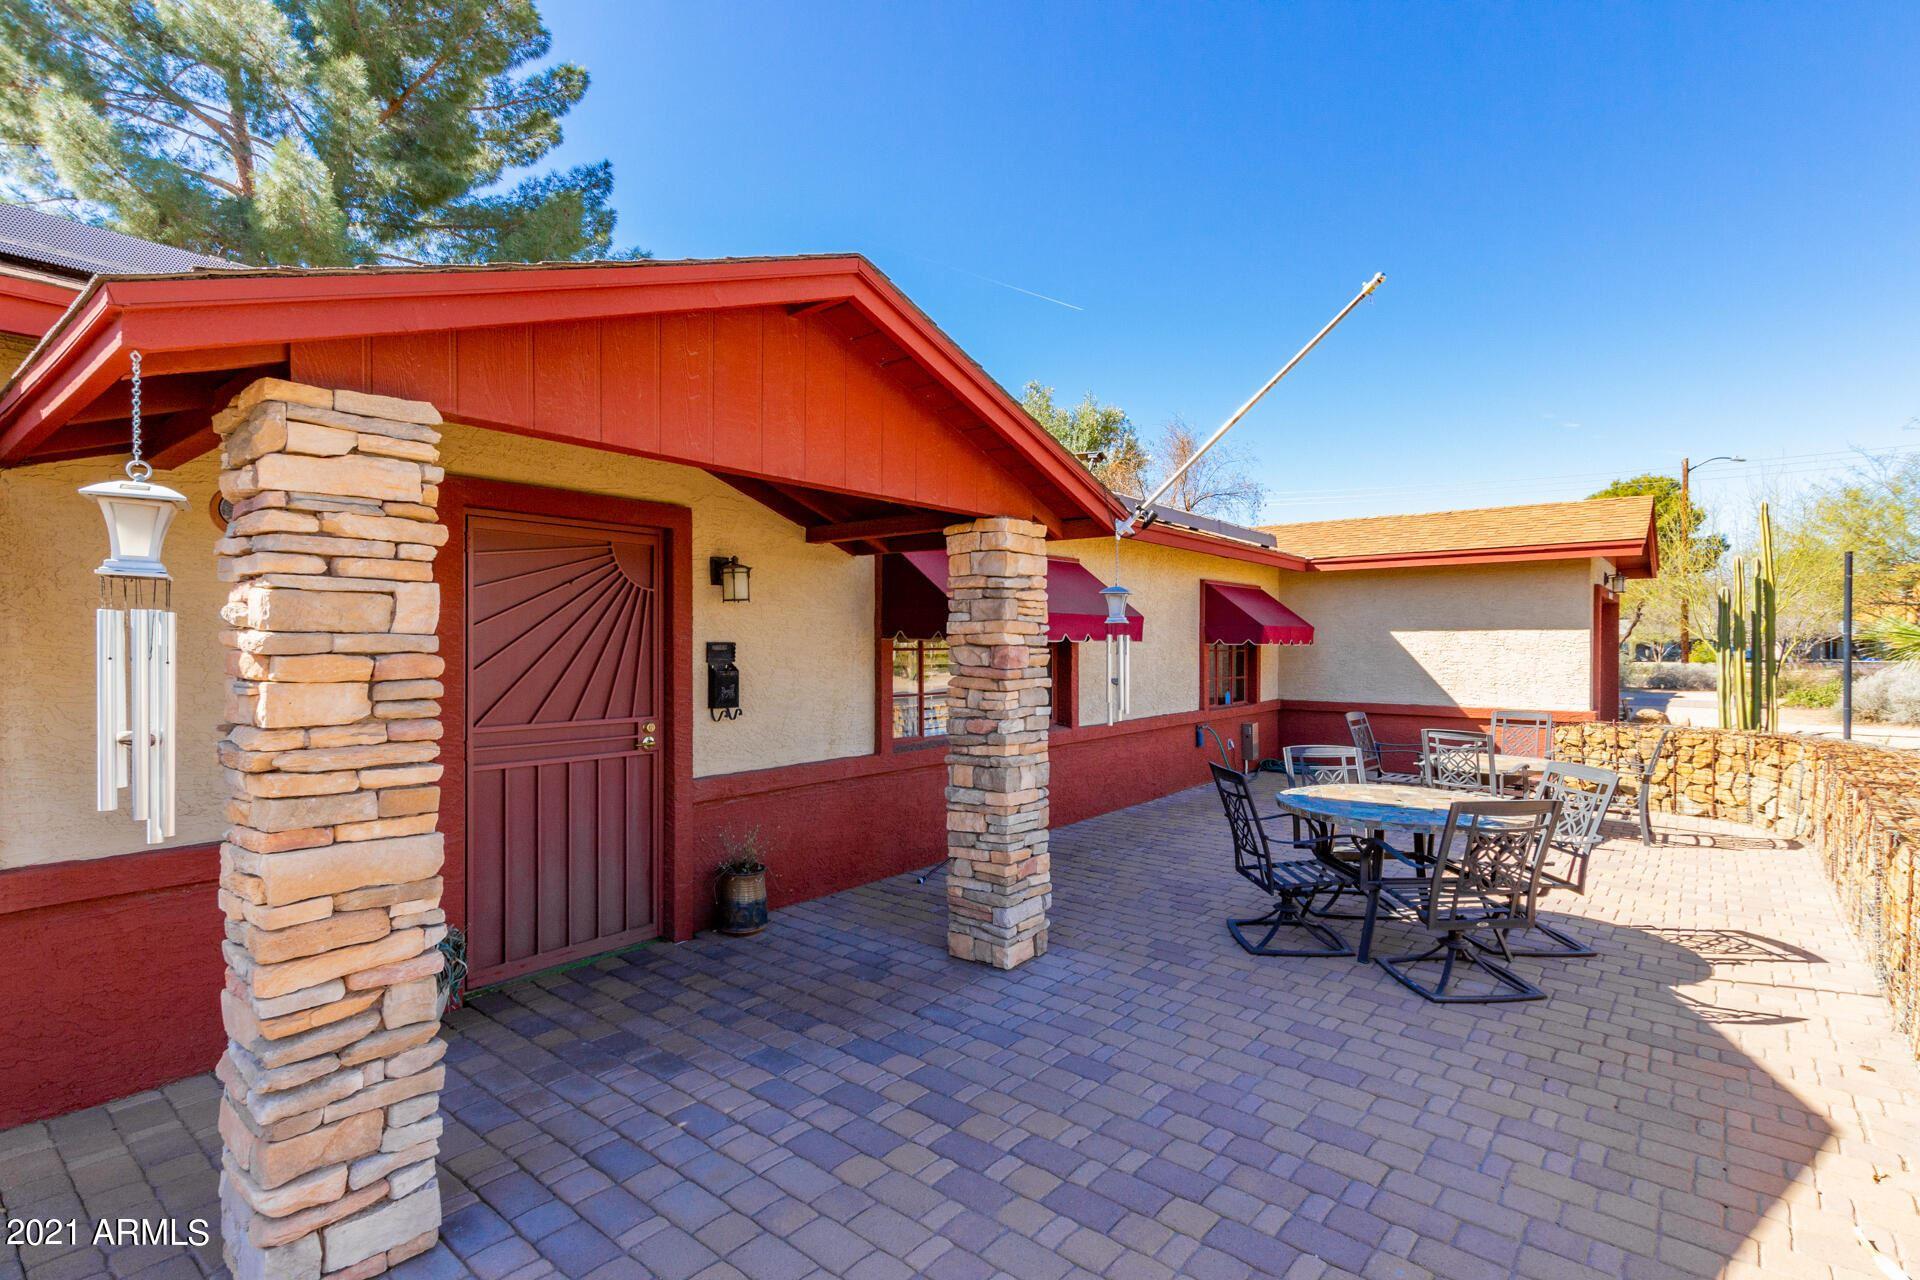 Photo of 1007 E DENTON Lane, Phoenix, AZ 85014 (MLS # 6201702)